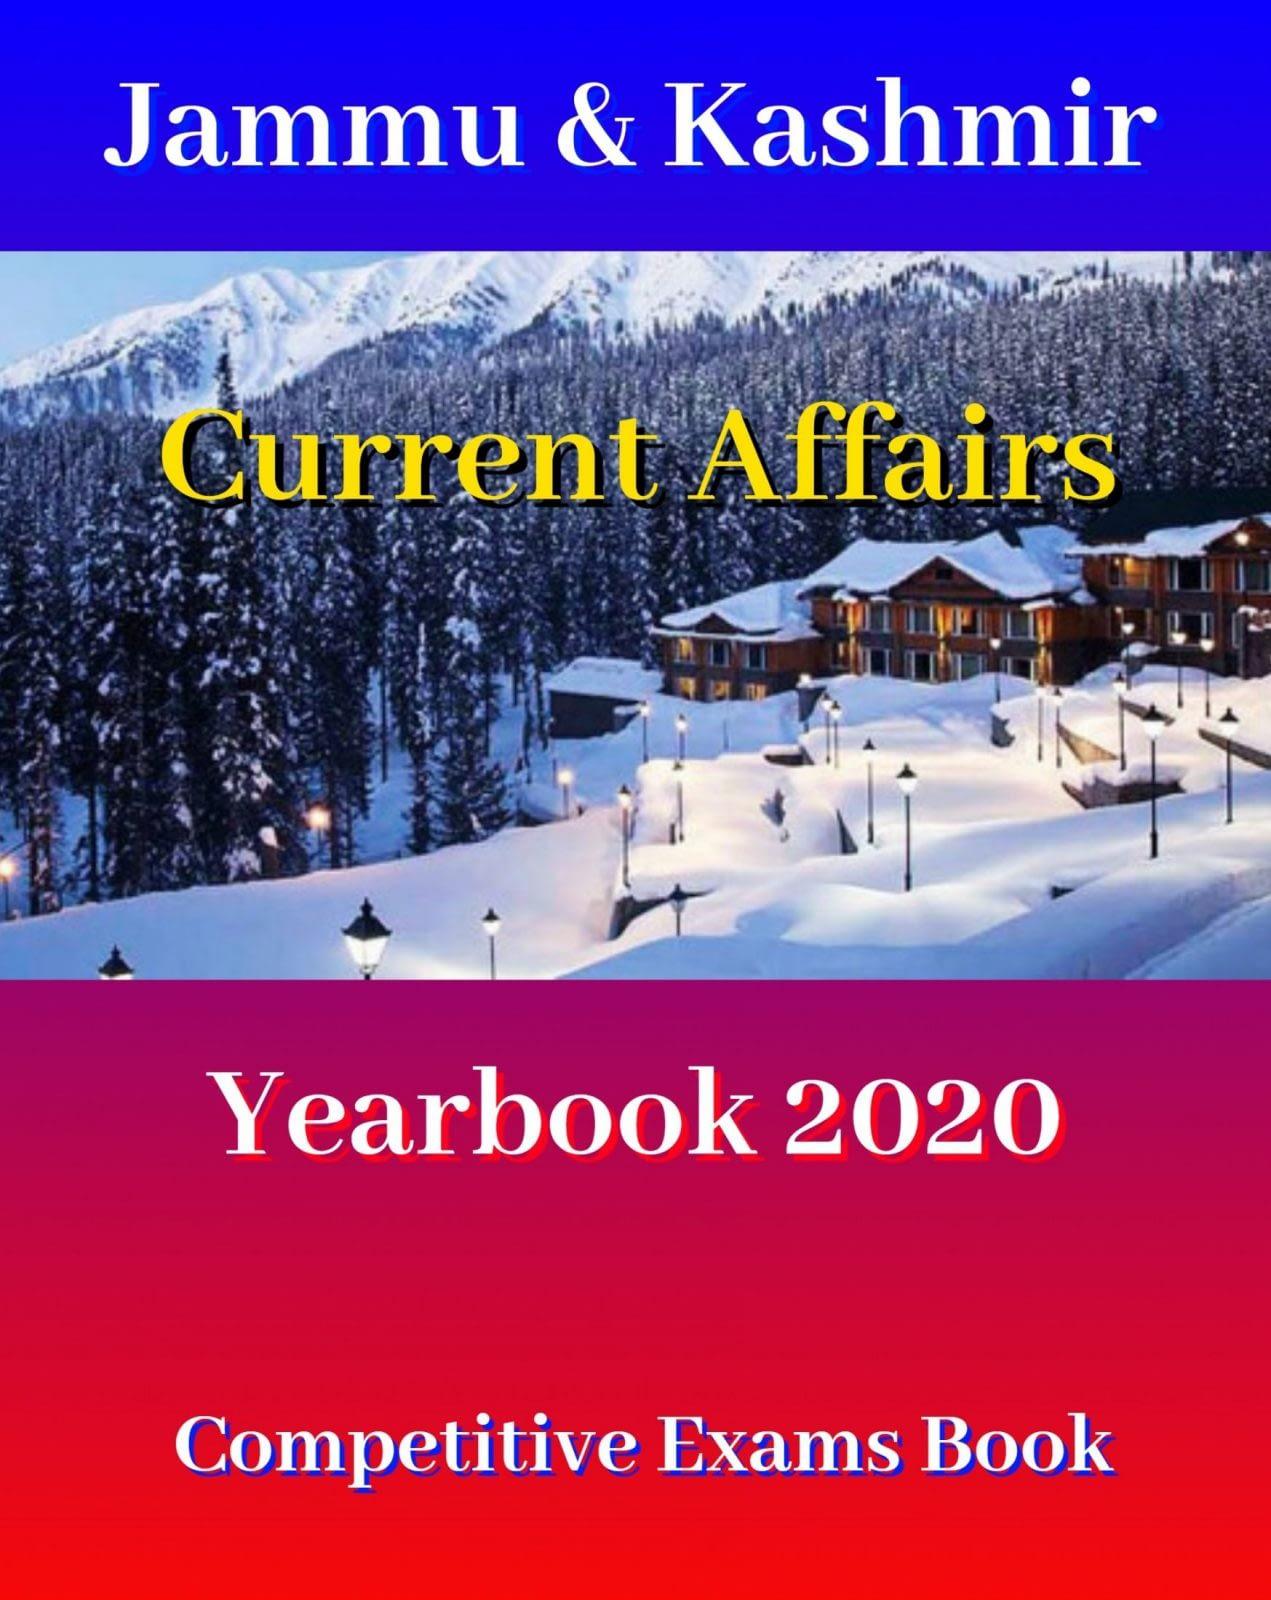 Jammu & Kashmir Current Affairs General Knowledge Yearbook 2020